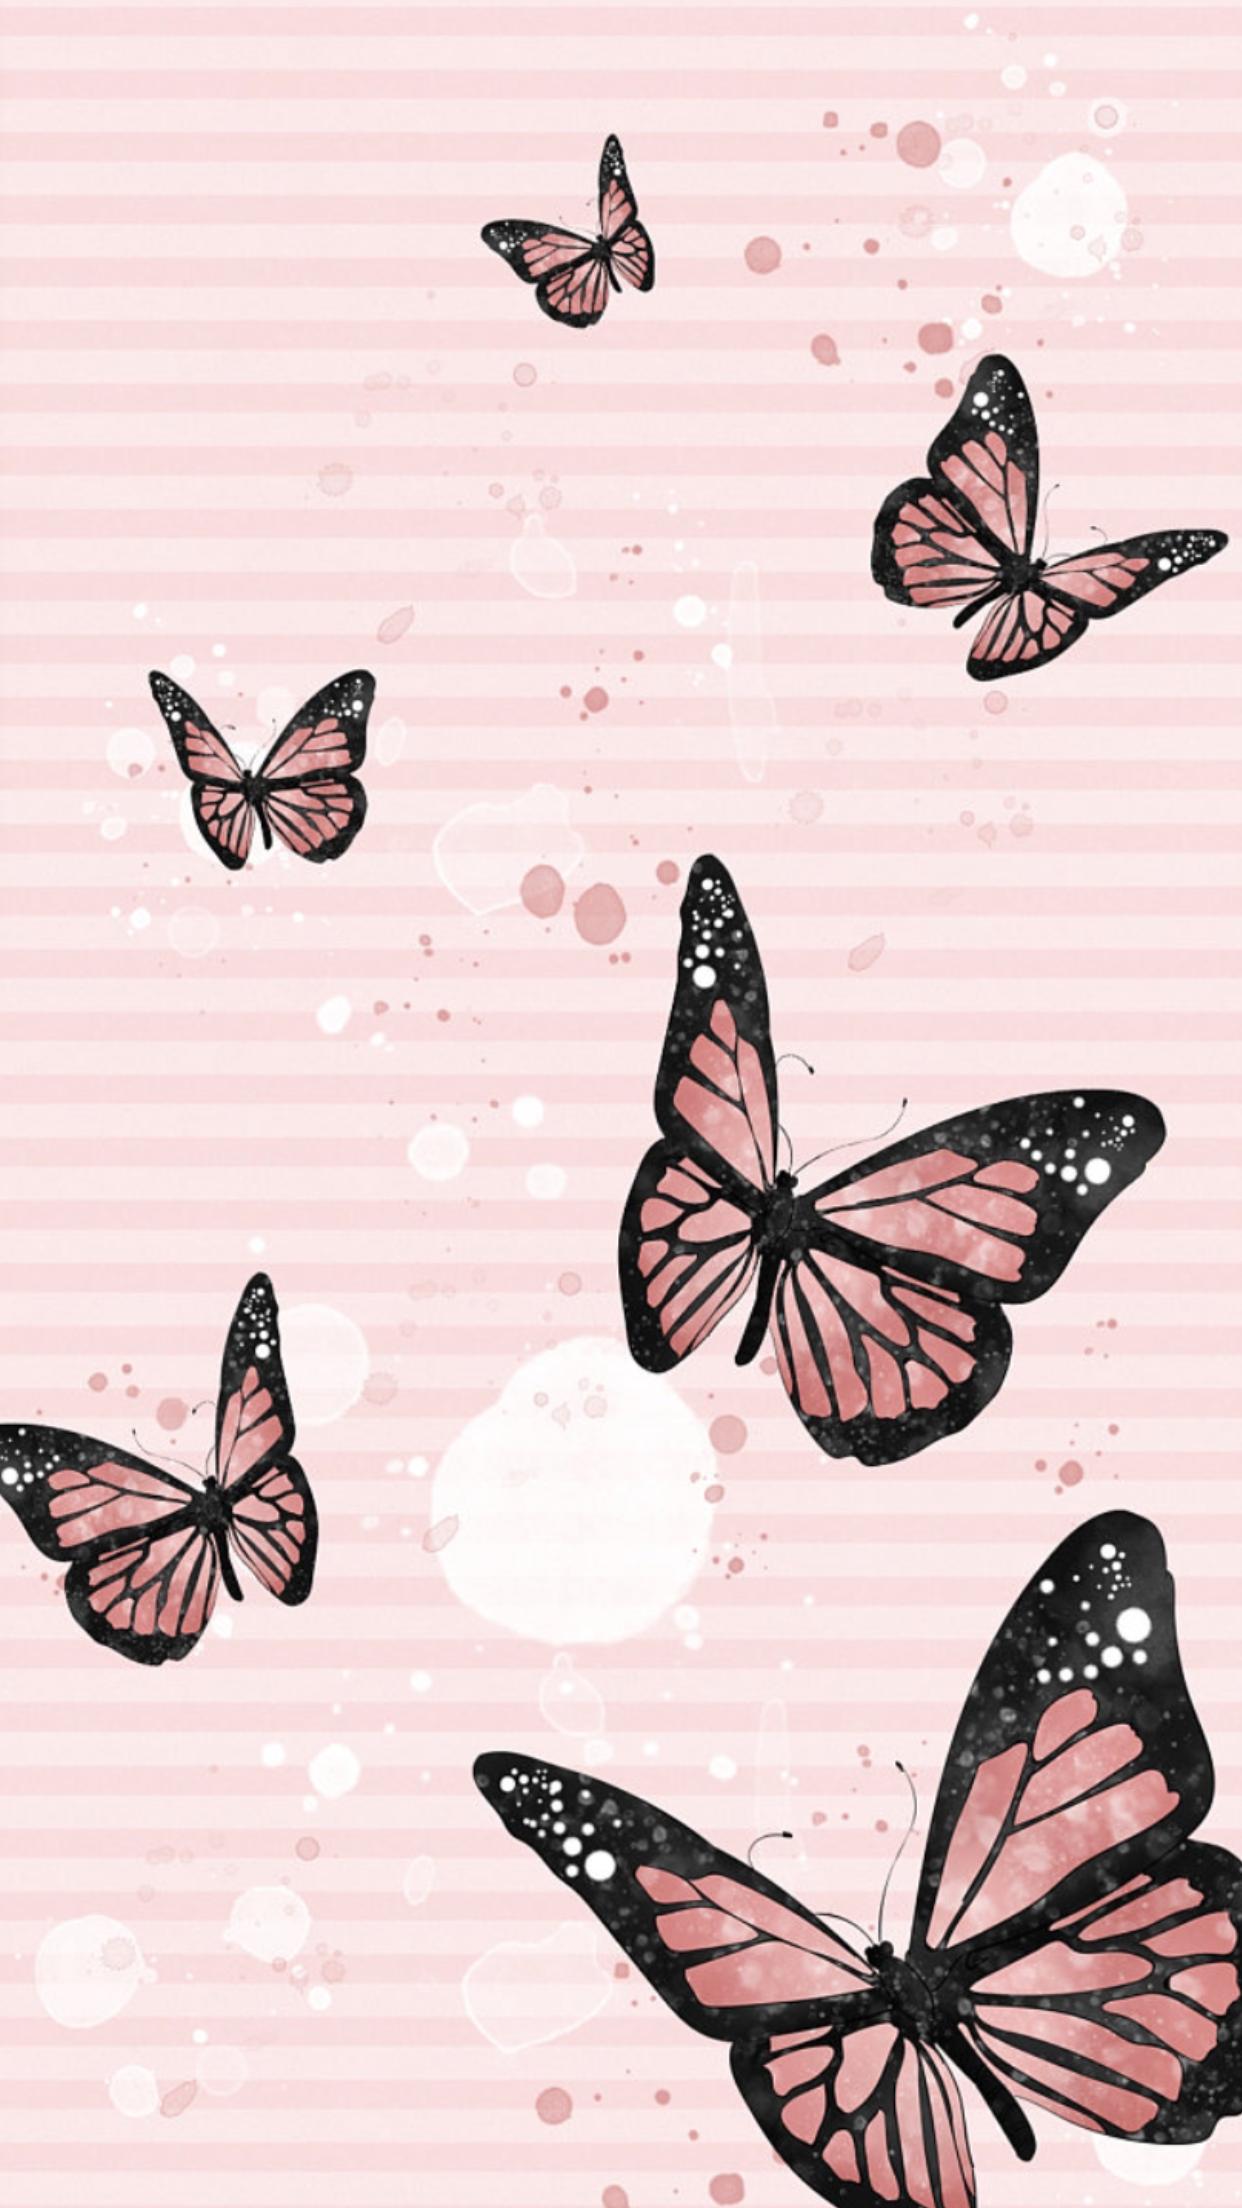 ꭵꮲhsnye ꮃallpapyerѕ Iphone Wallpaper Tumblr Aesthetic Butterfly Wallpaper Iphone Pretty Phone Wallpaper